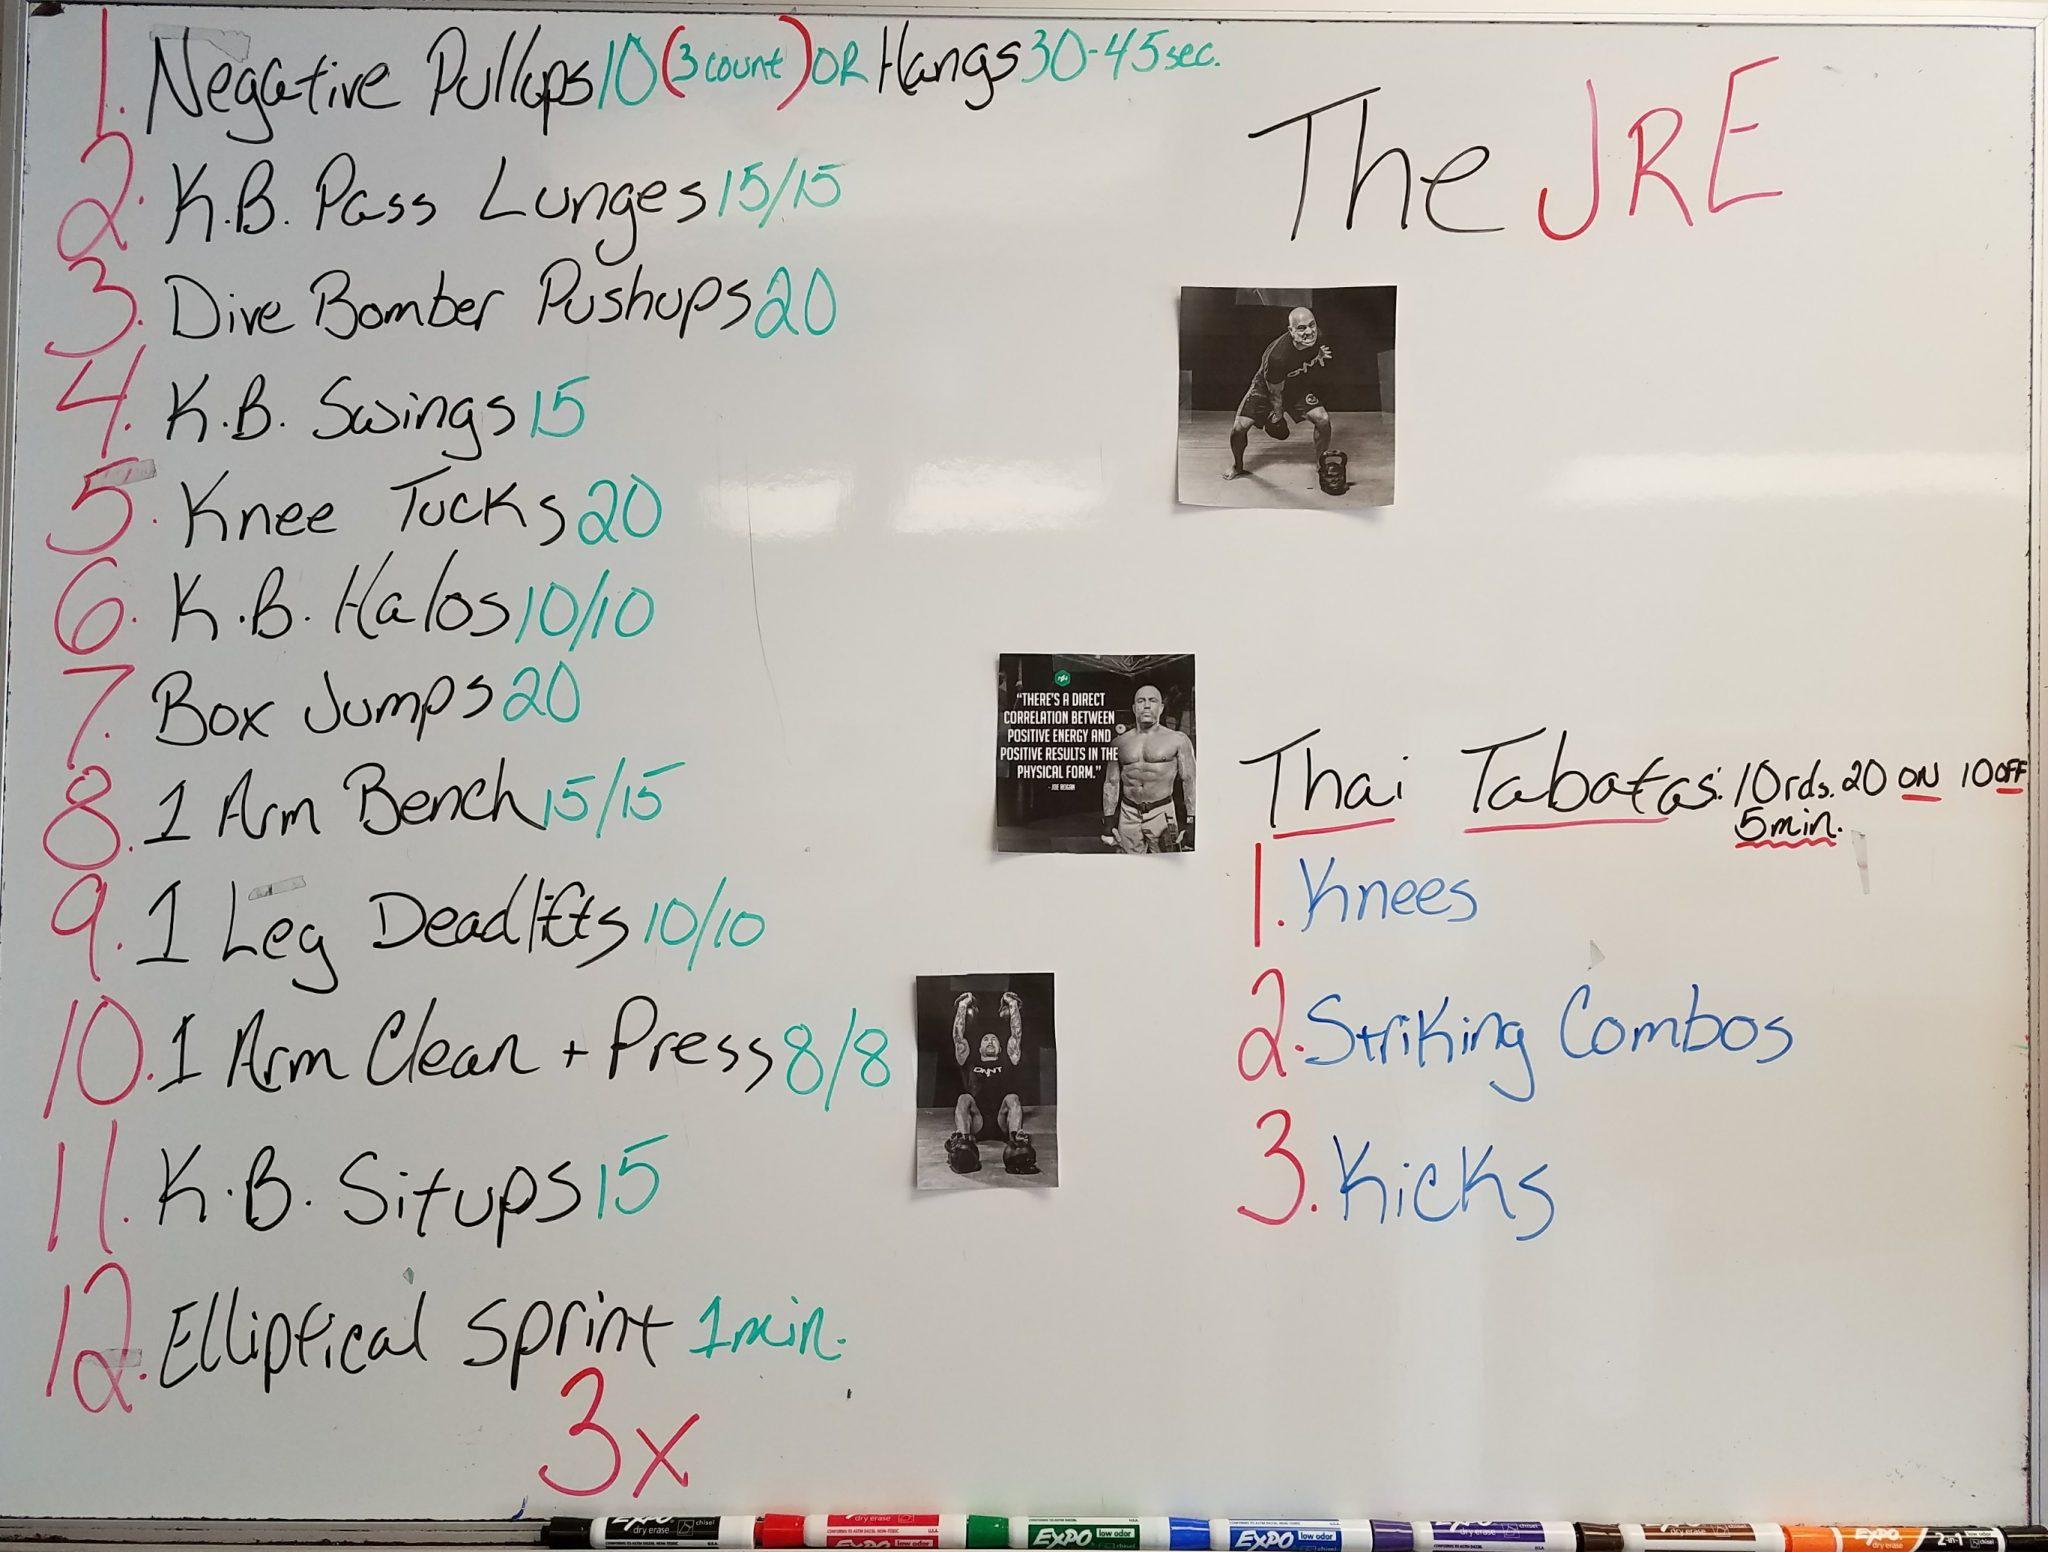 Joe Rogan Experience workout